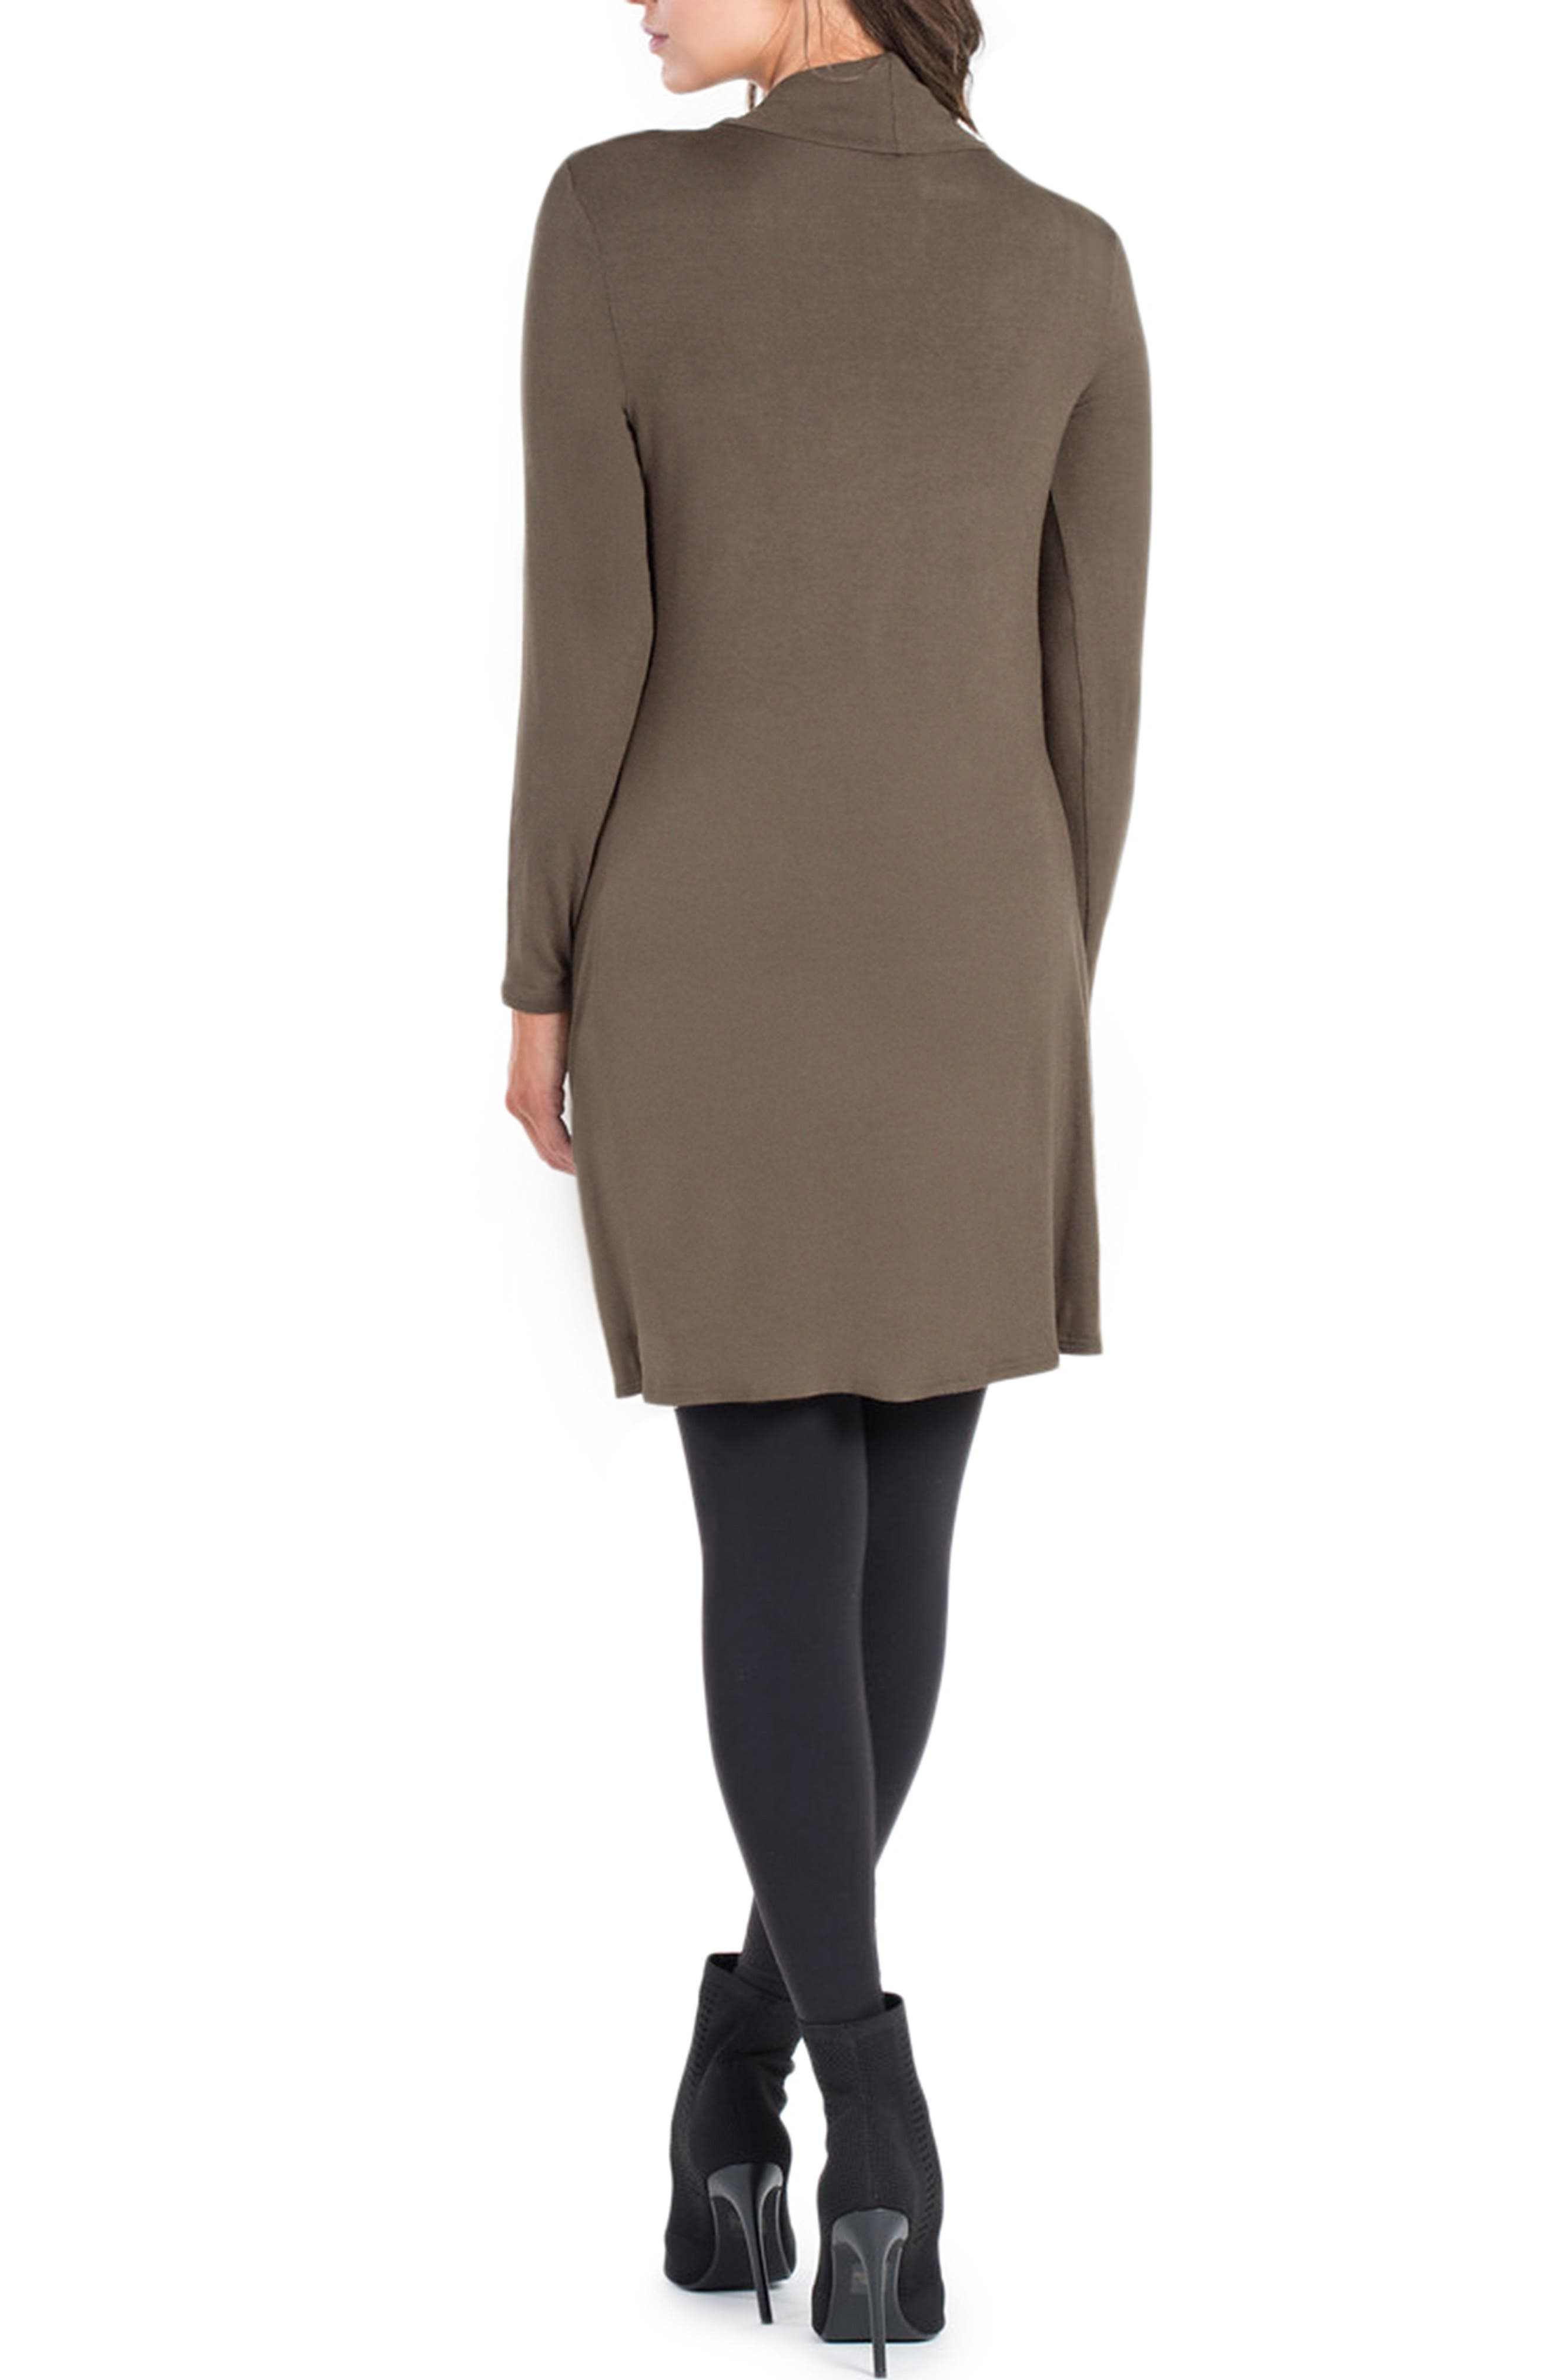 Nara Crossover Maternity/Nursing Tunic with Camisole,                             Alternate thumbnail 2, color,                             DARK OLIVE/ BLACK CAMI